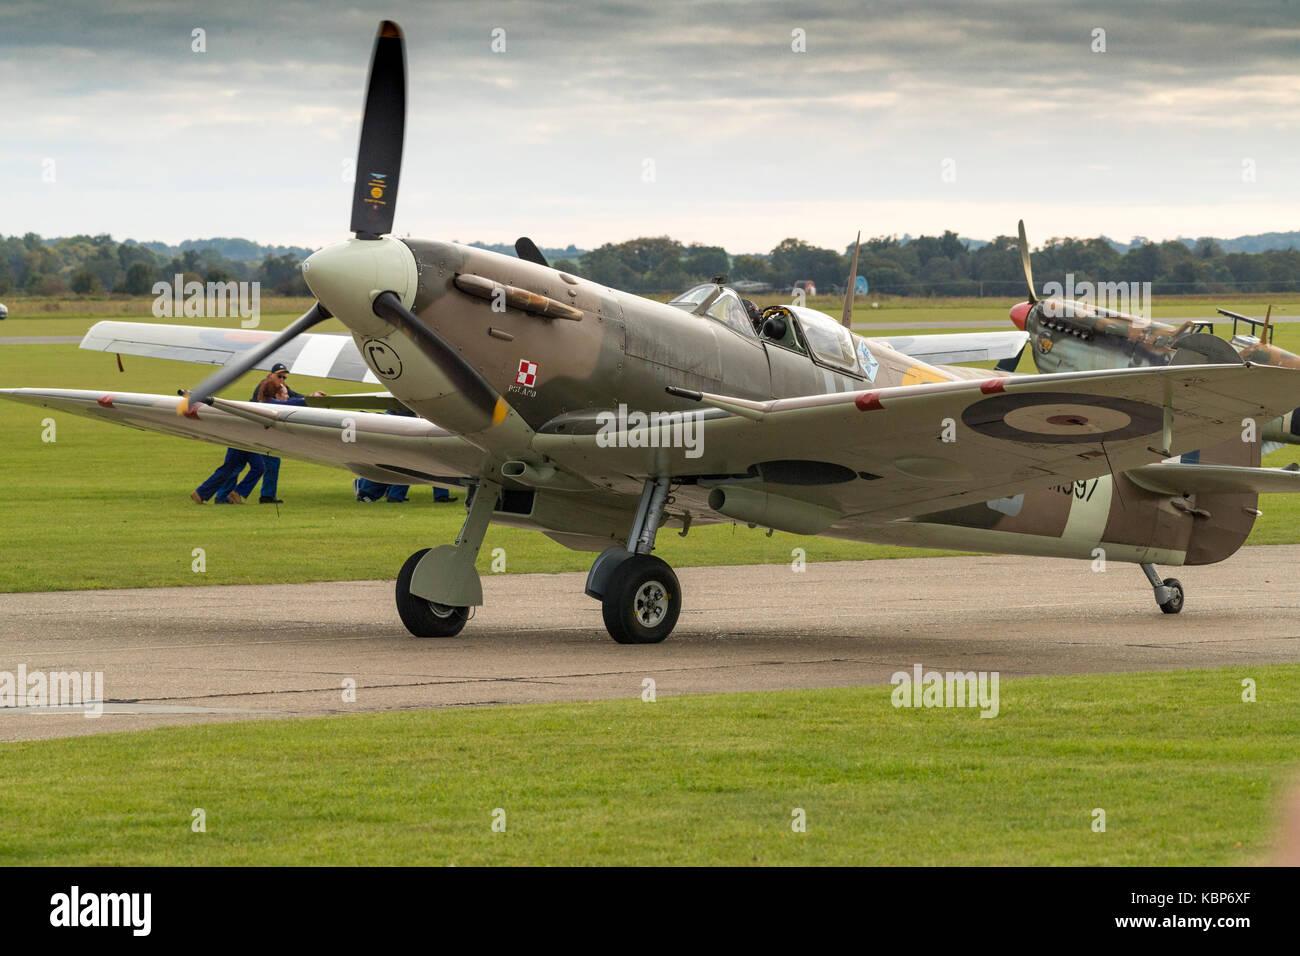 Spitfires,Duxford, Battle of Britain,WW2,planes,propellor,Merlin,engine,messerschmitt,pilots,airfield,Douglas Bader,machine - Stock Image